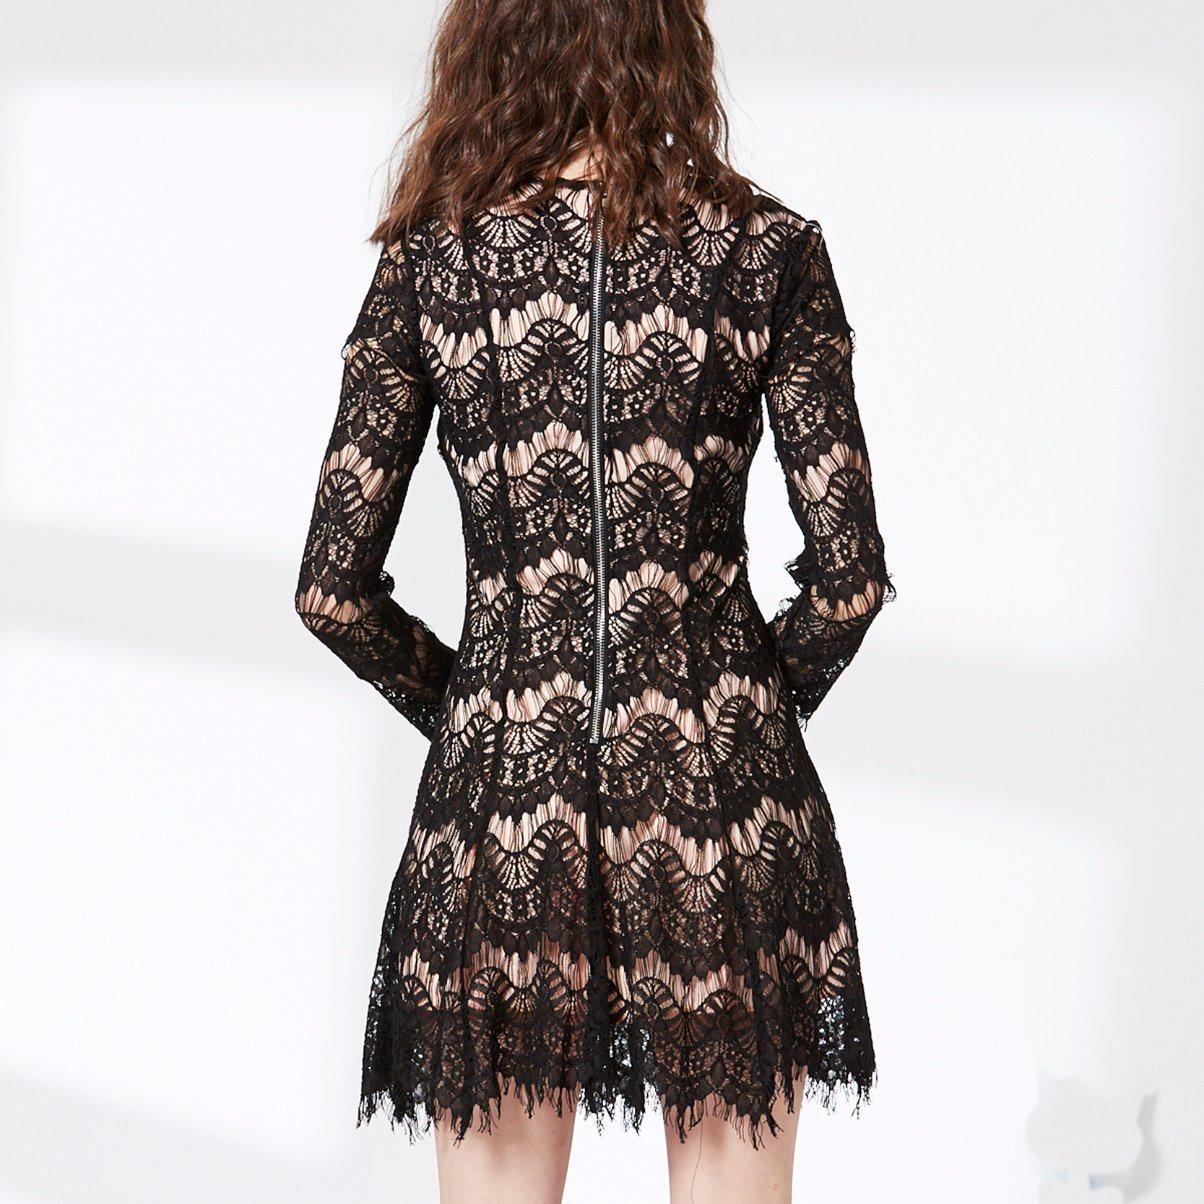 High Quality Women Bandage Bodycon Fashion Lace Dress